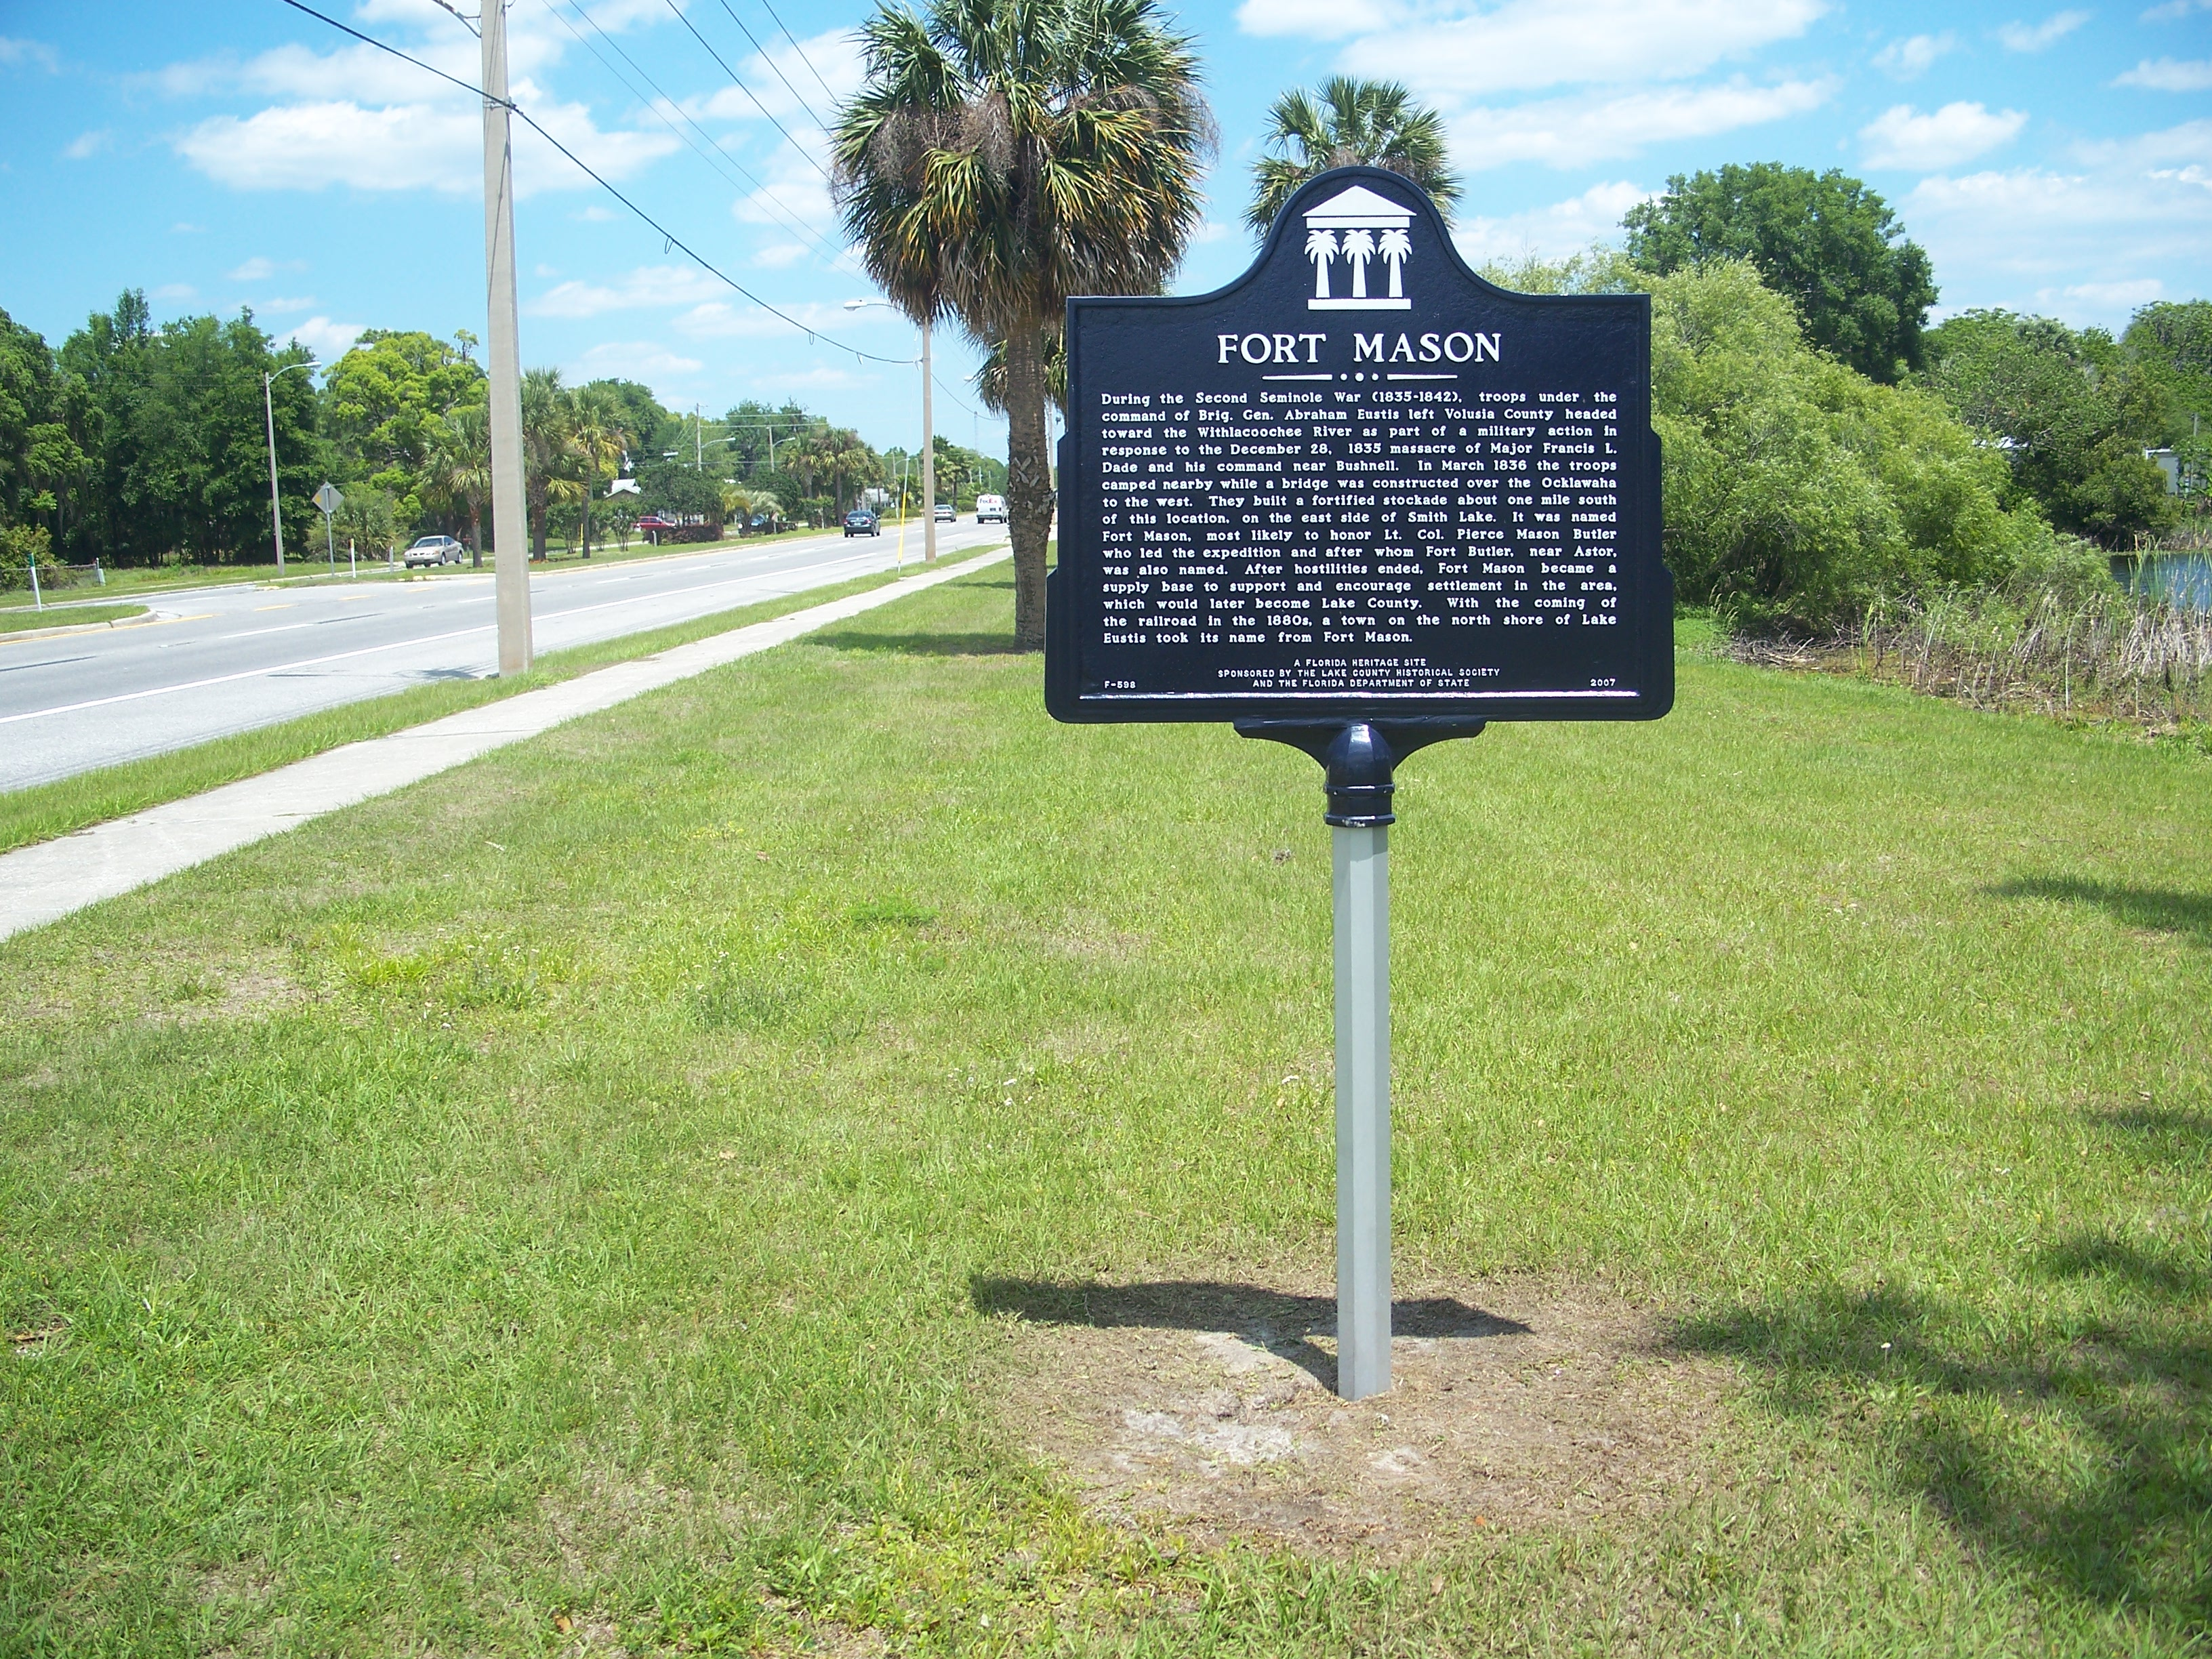 File:Umatilla FL Fort Mason plaque01.jpg - Wikimedia Commons